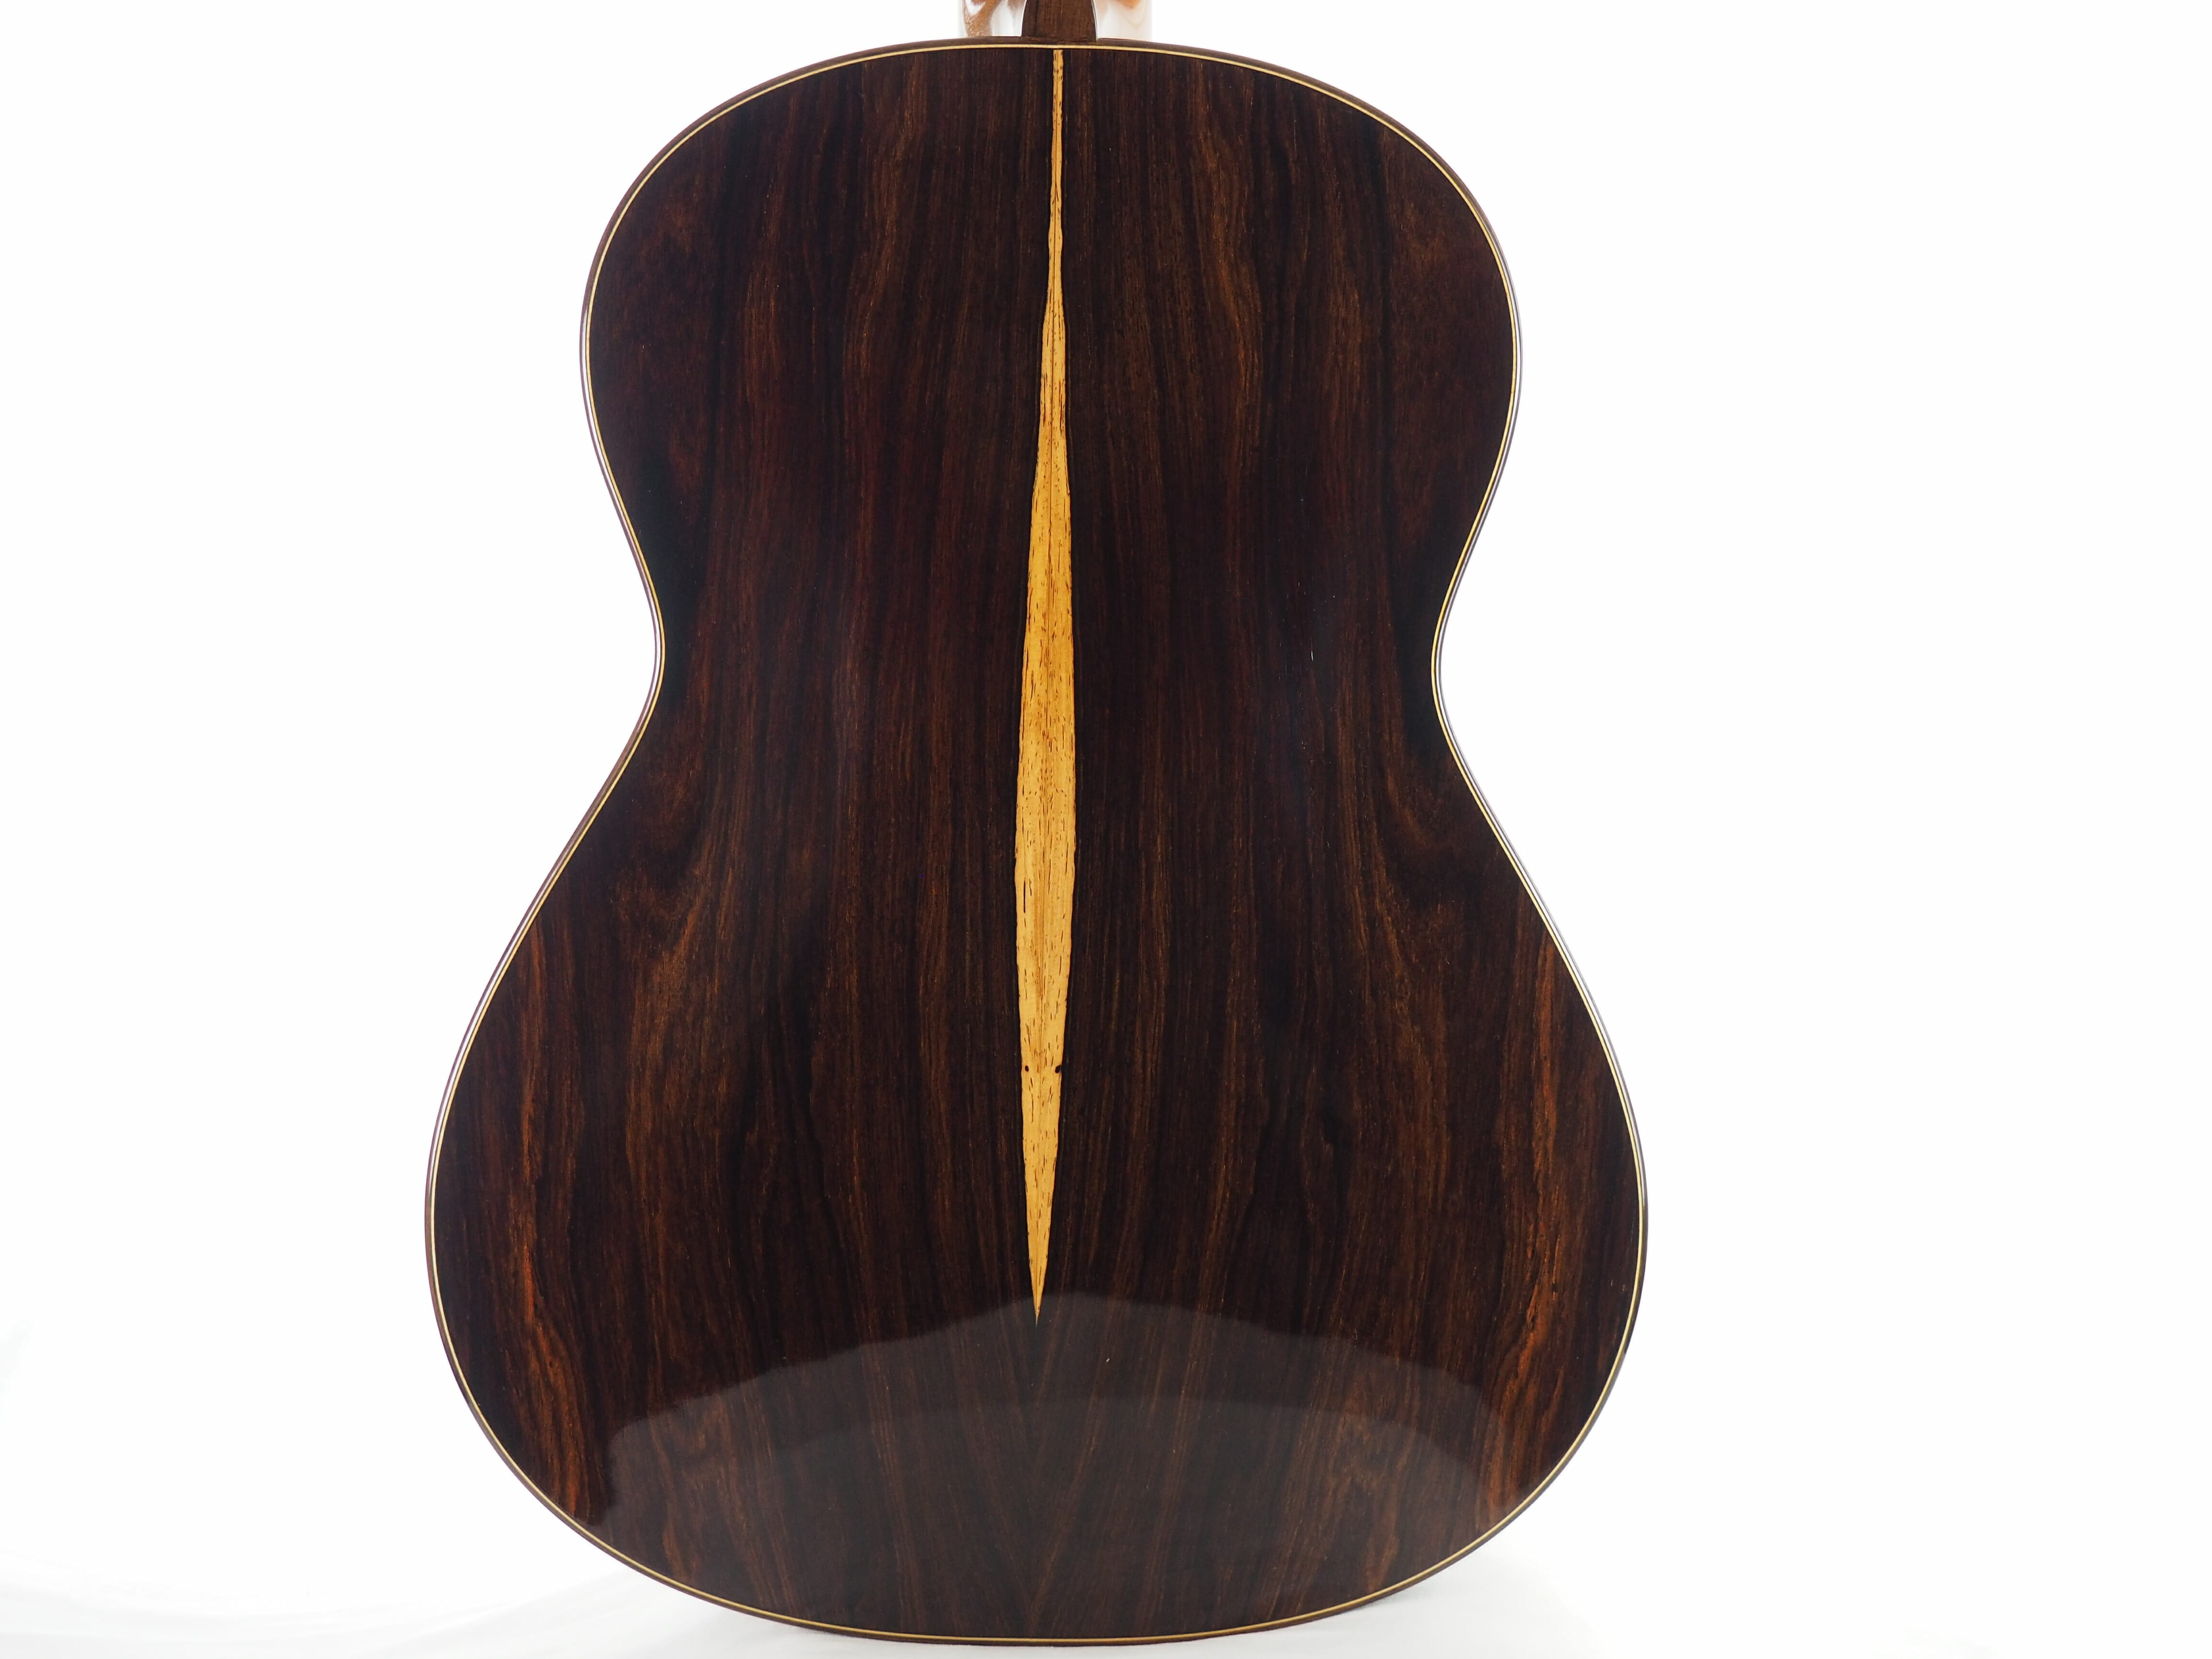 Luthier Kim Lissarrague classical guitar